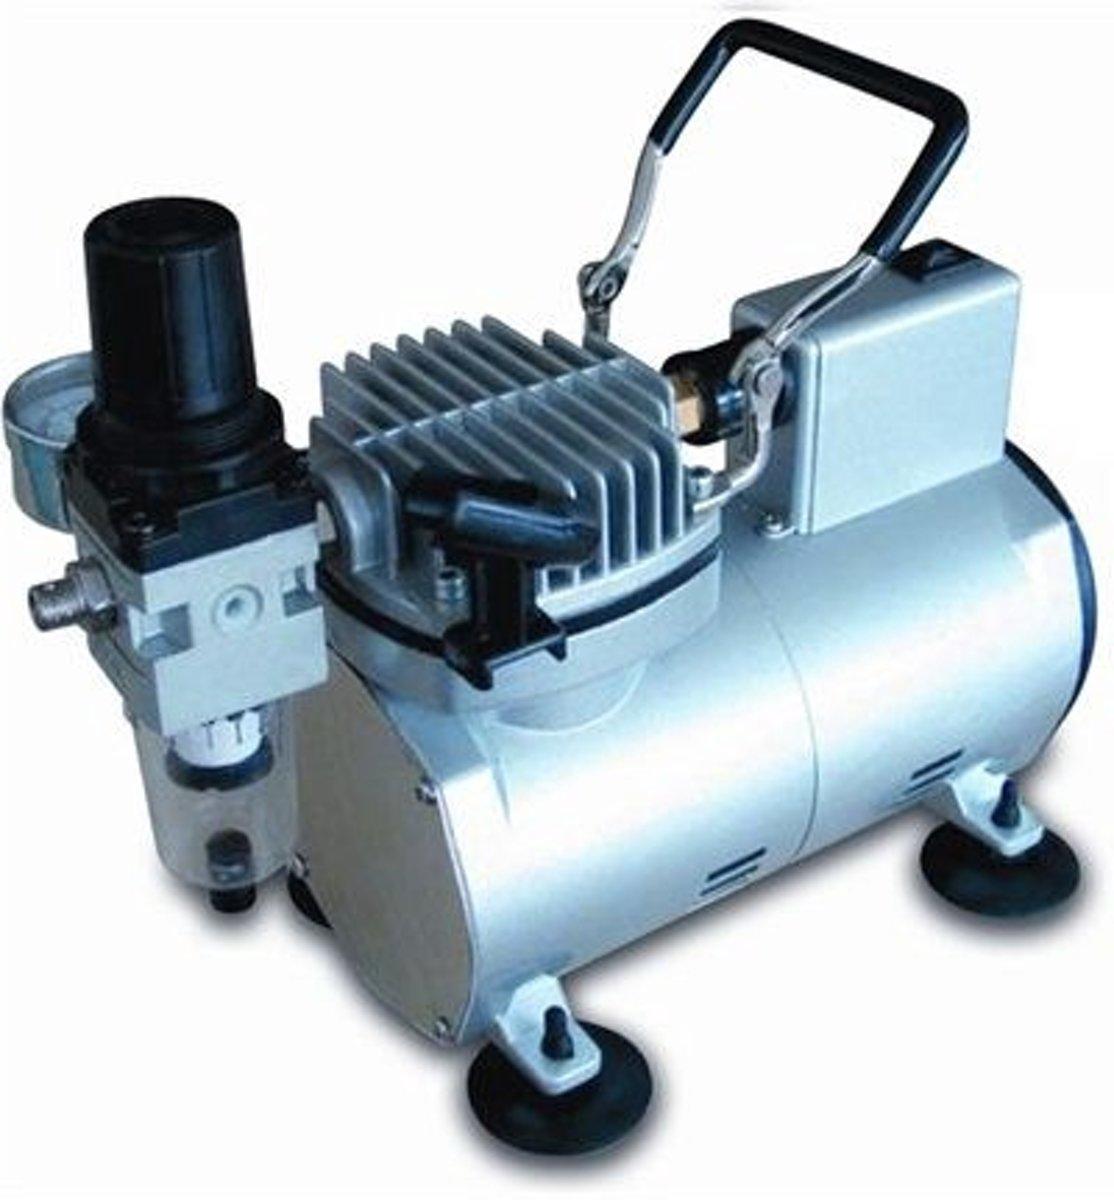 Pentair compressor voor de Pro Valve PROV-CPR